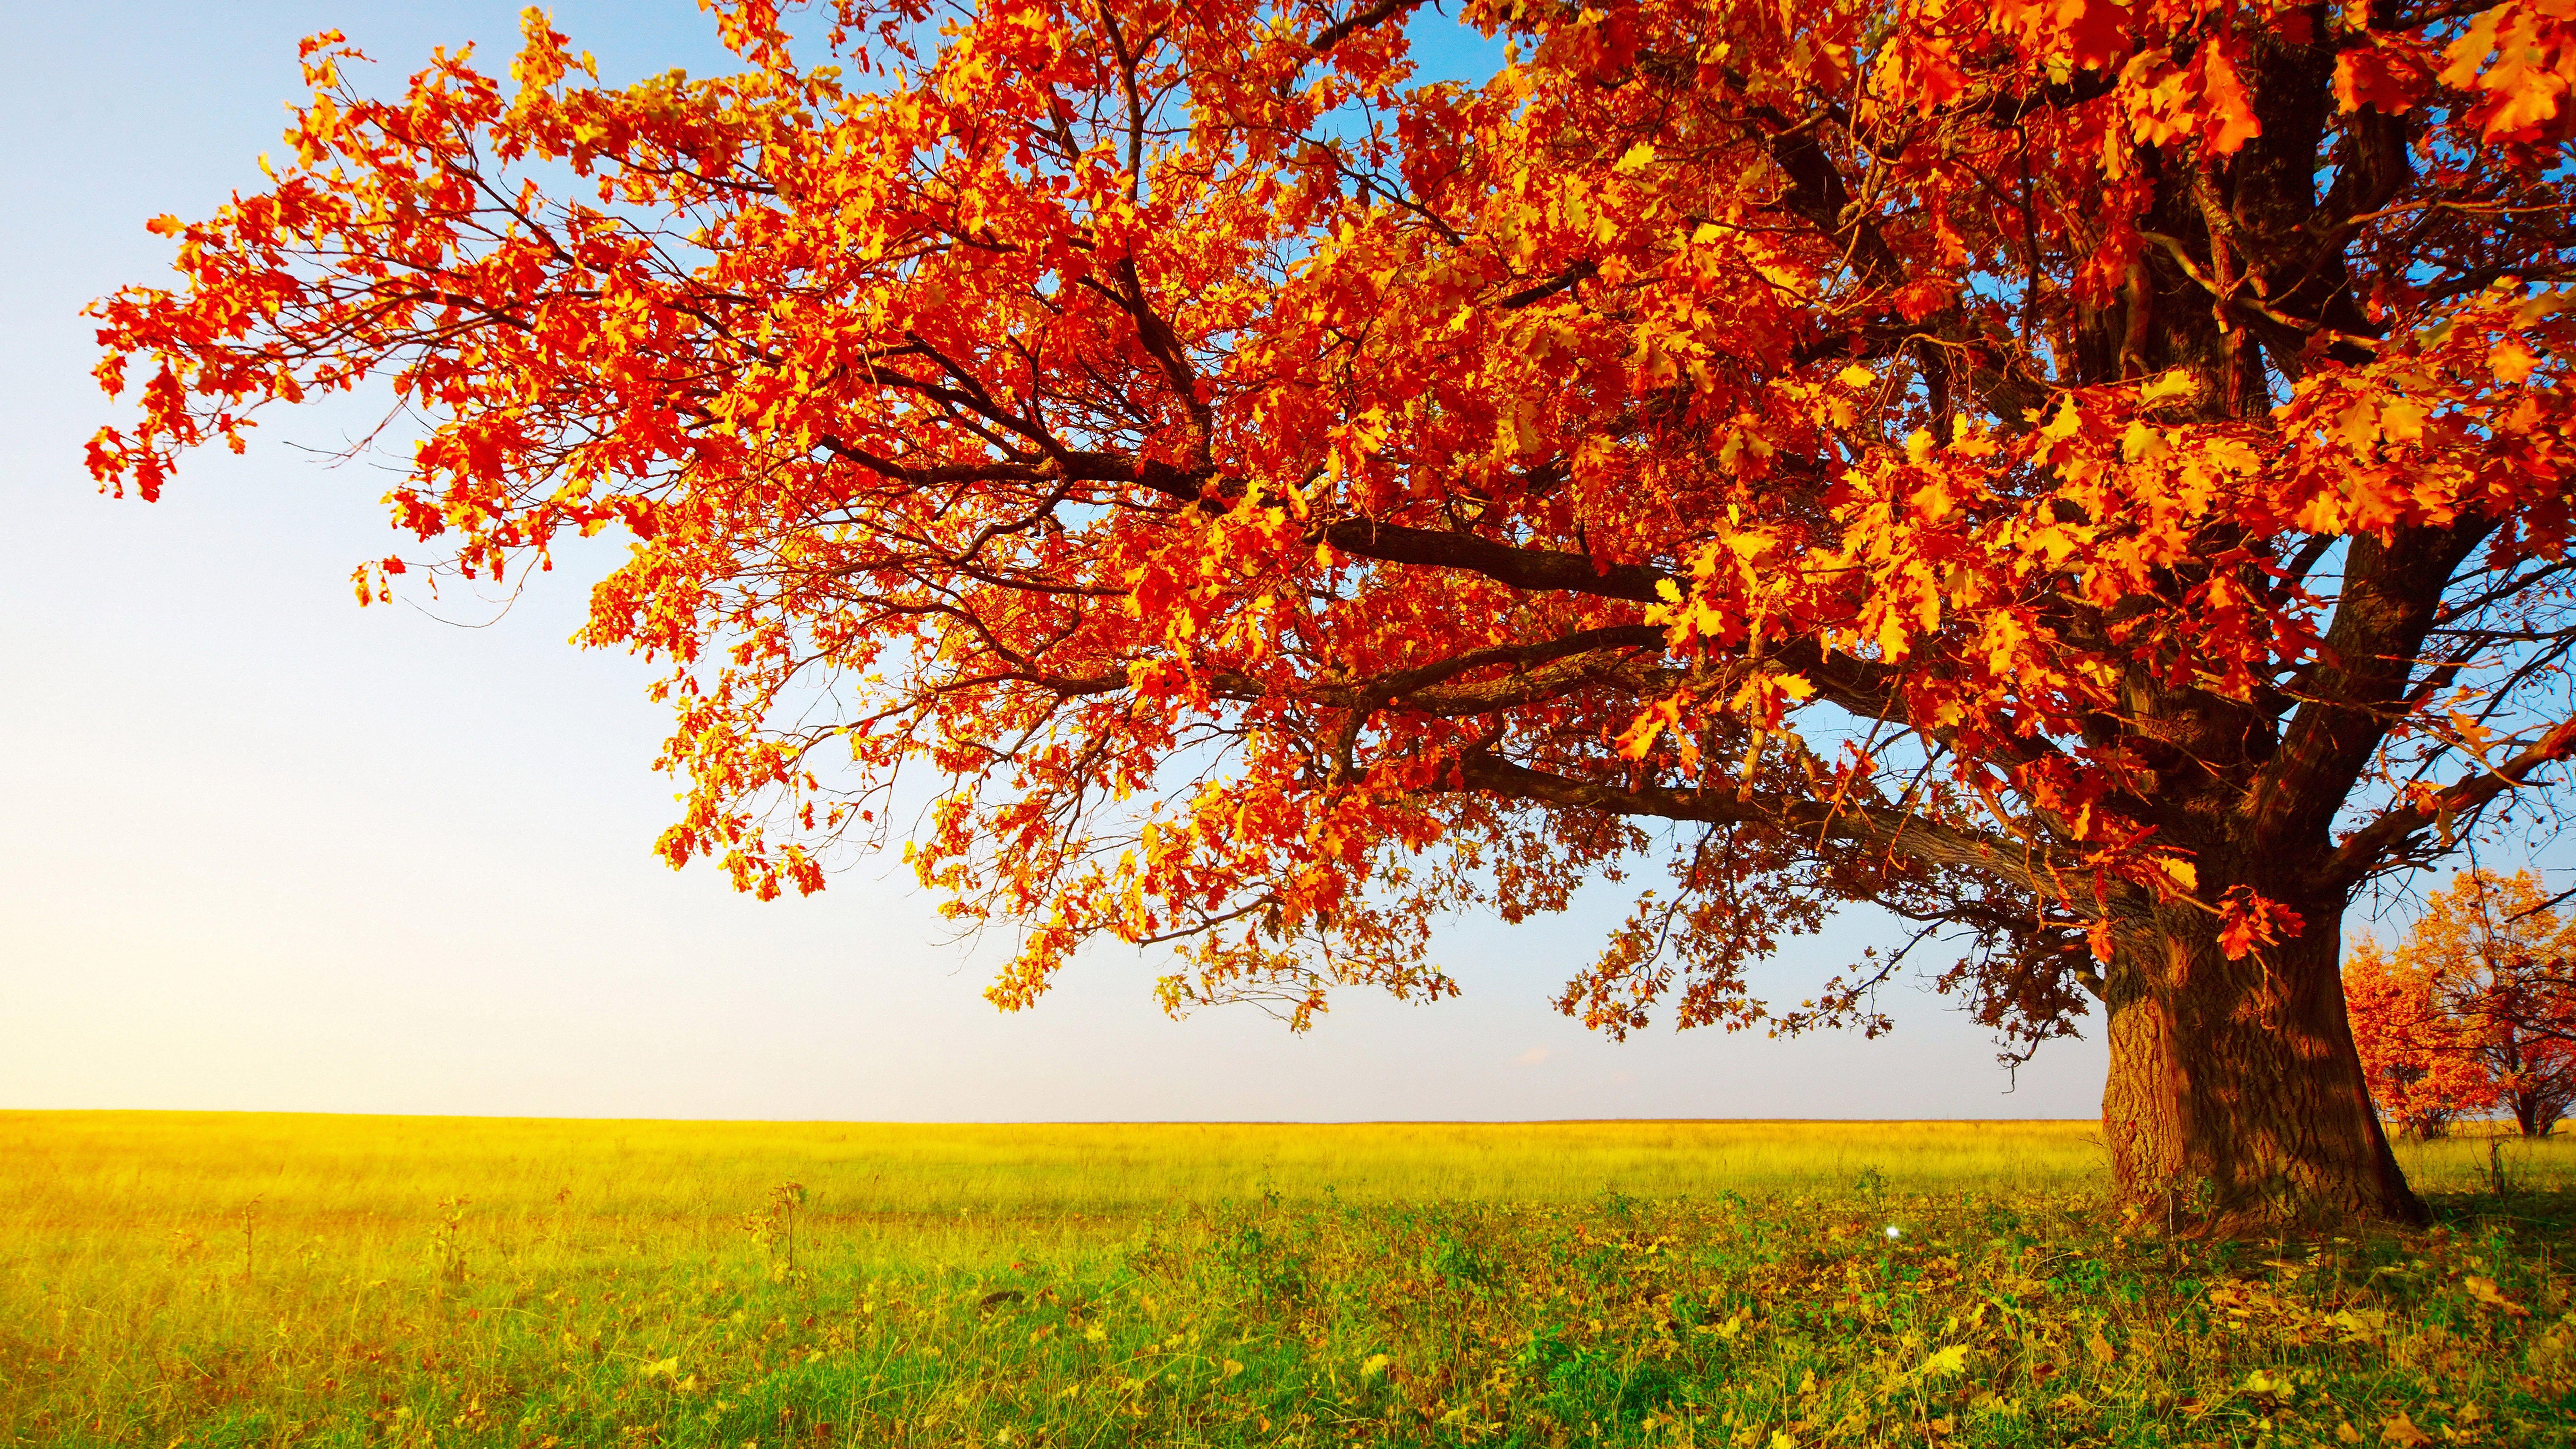 8k wallpaper fall landscape Árboles en otoño, Fondos de